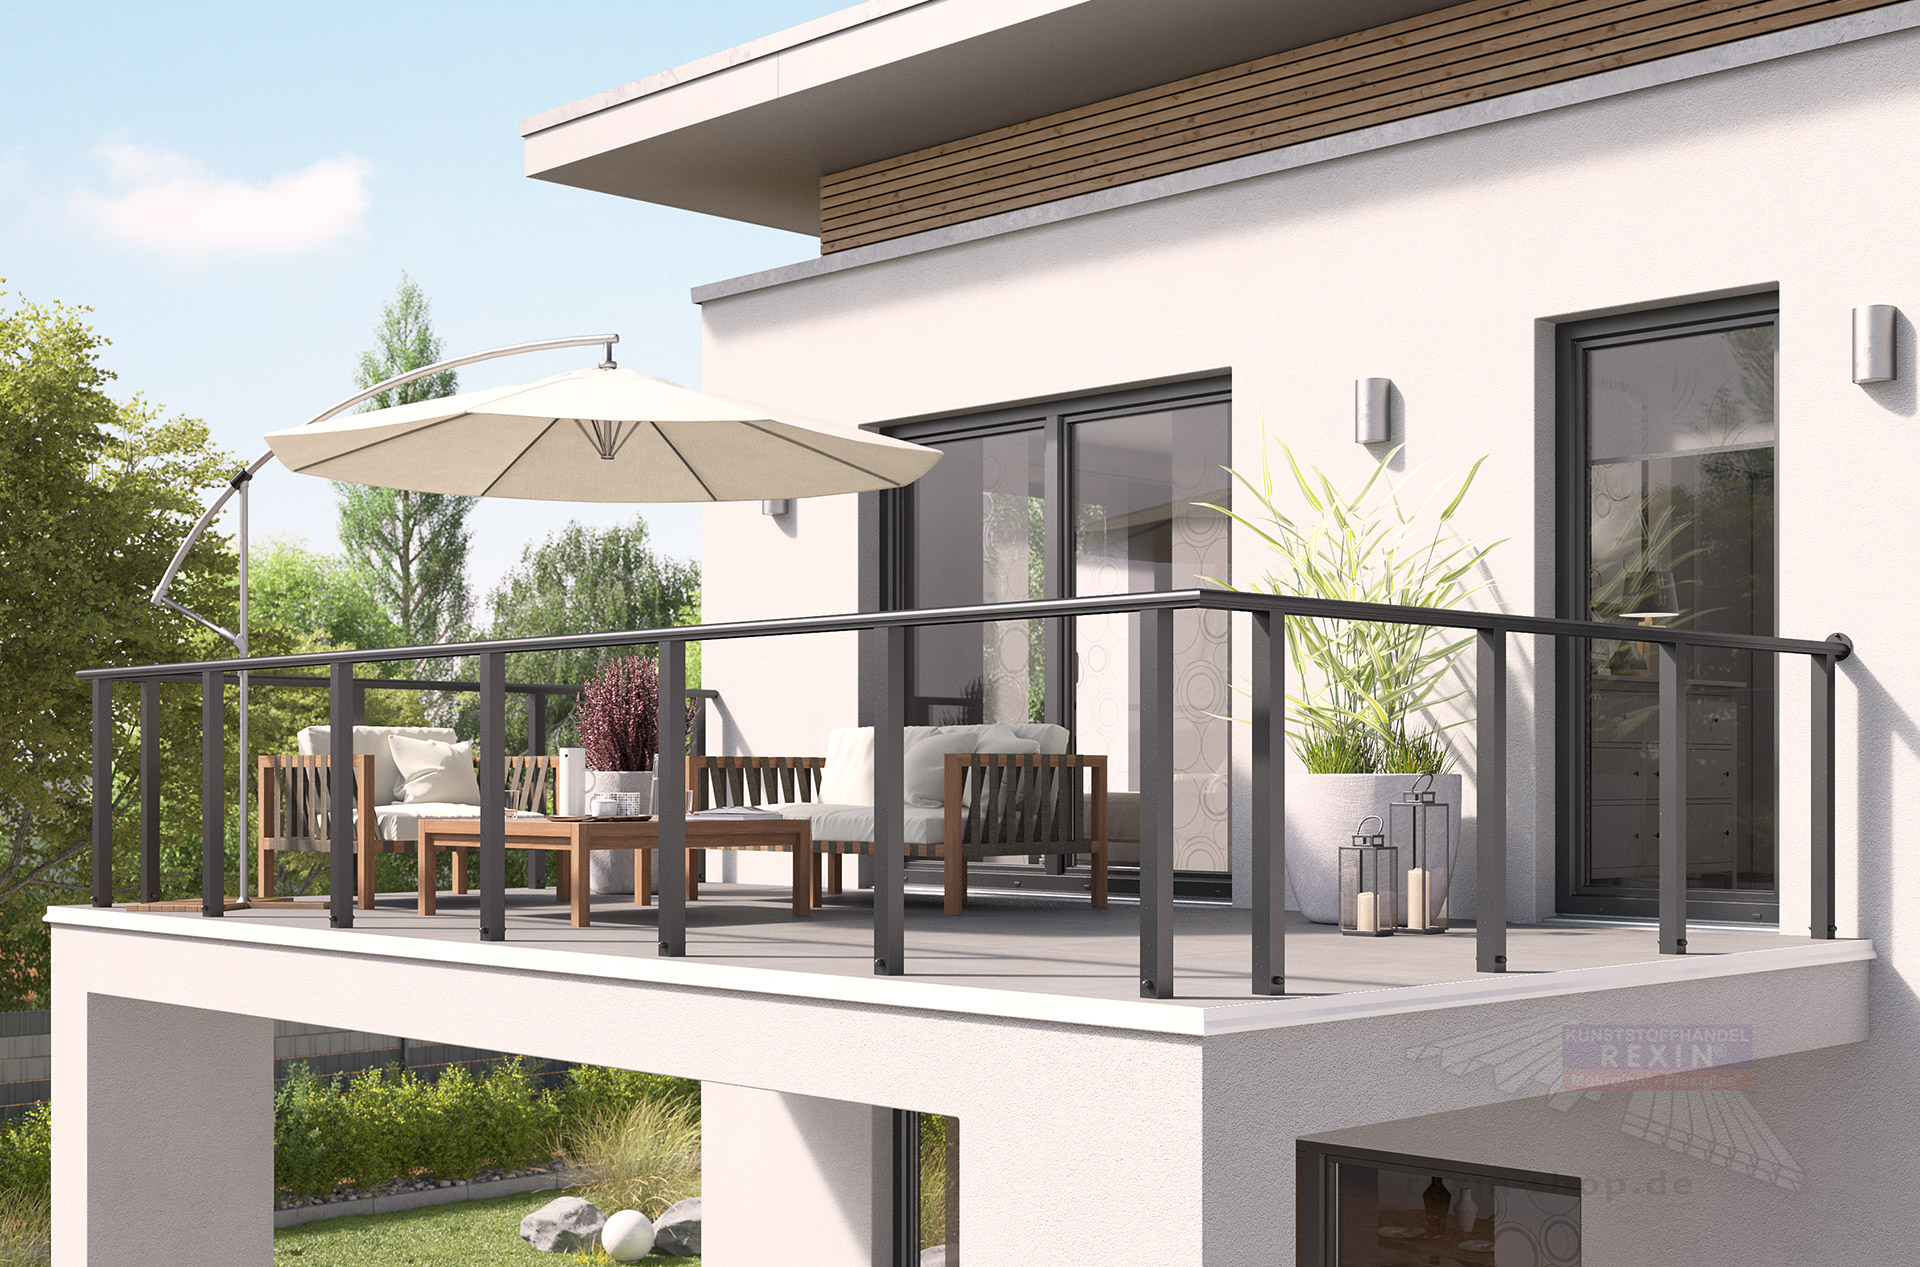 rexoguard alu balkongel nder 4m aufsatz konsole rexin shop. Black Bedroom Furniture Sets. Home Design Ideas